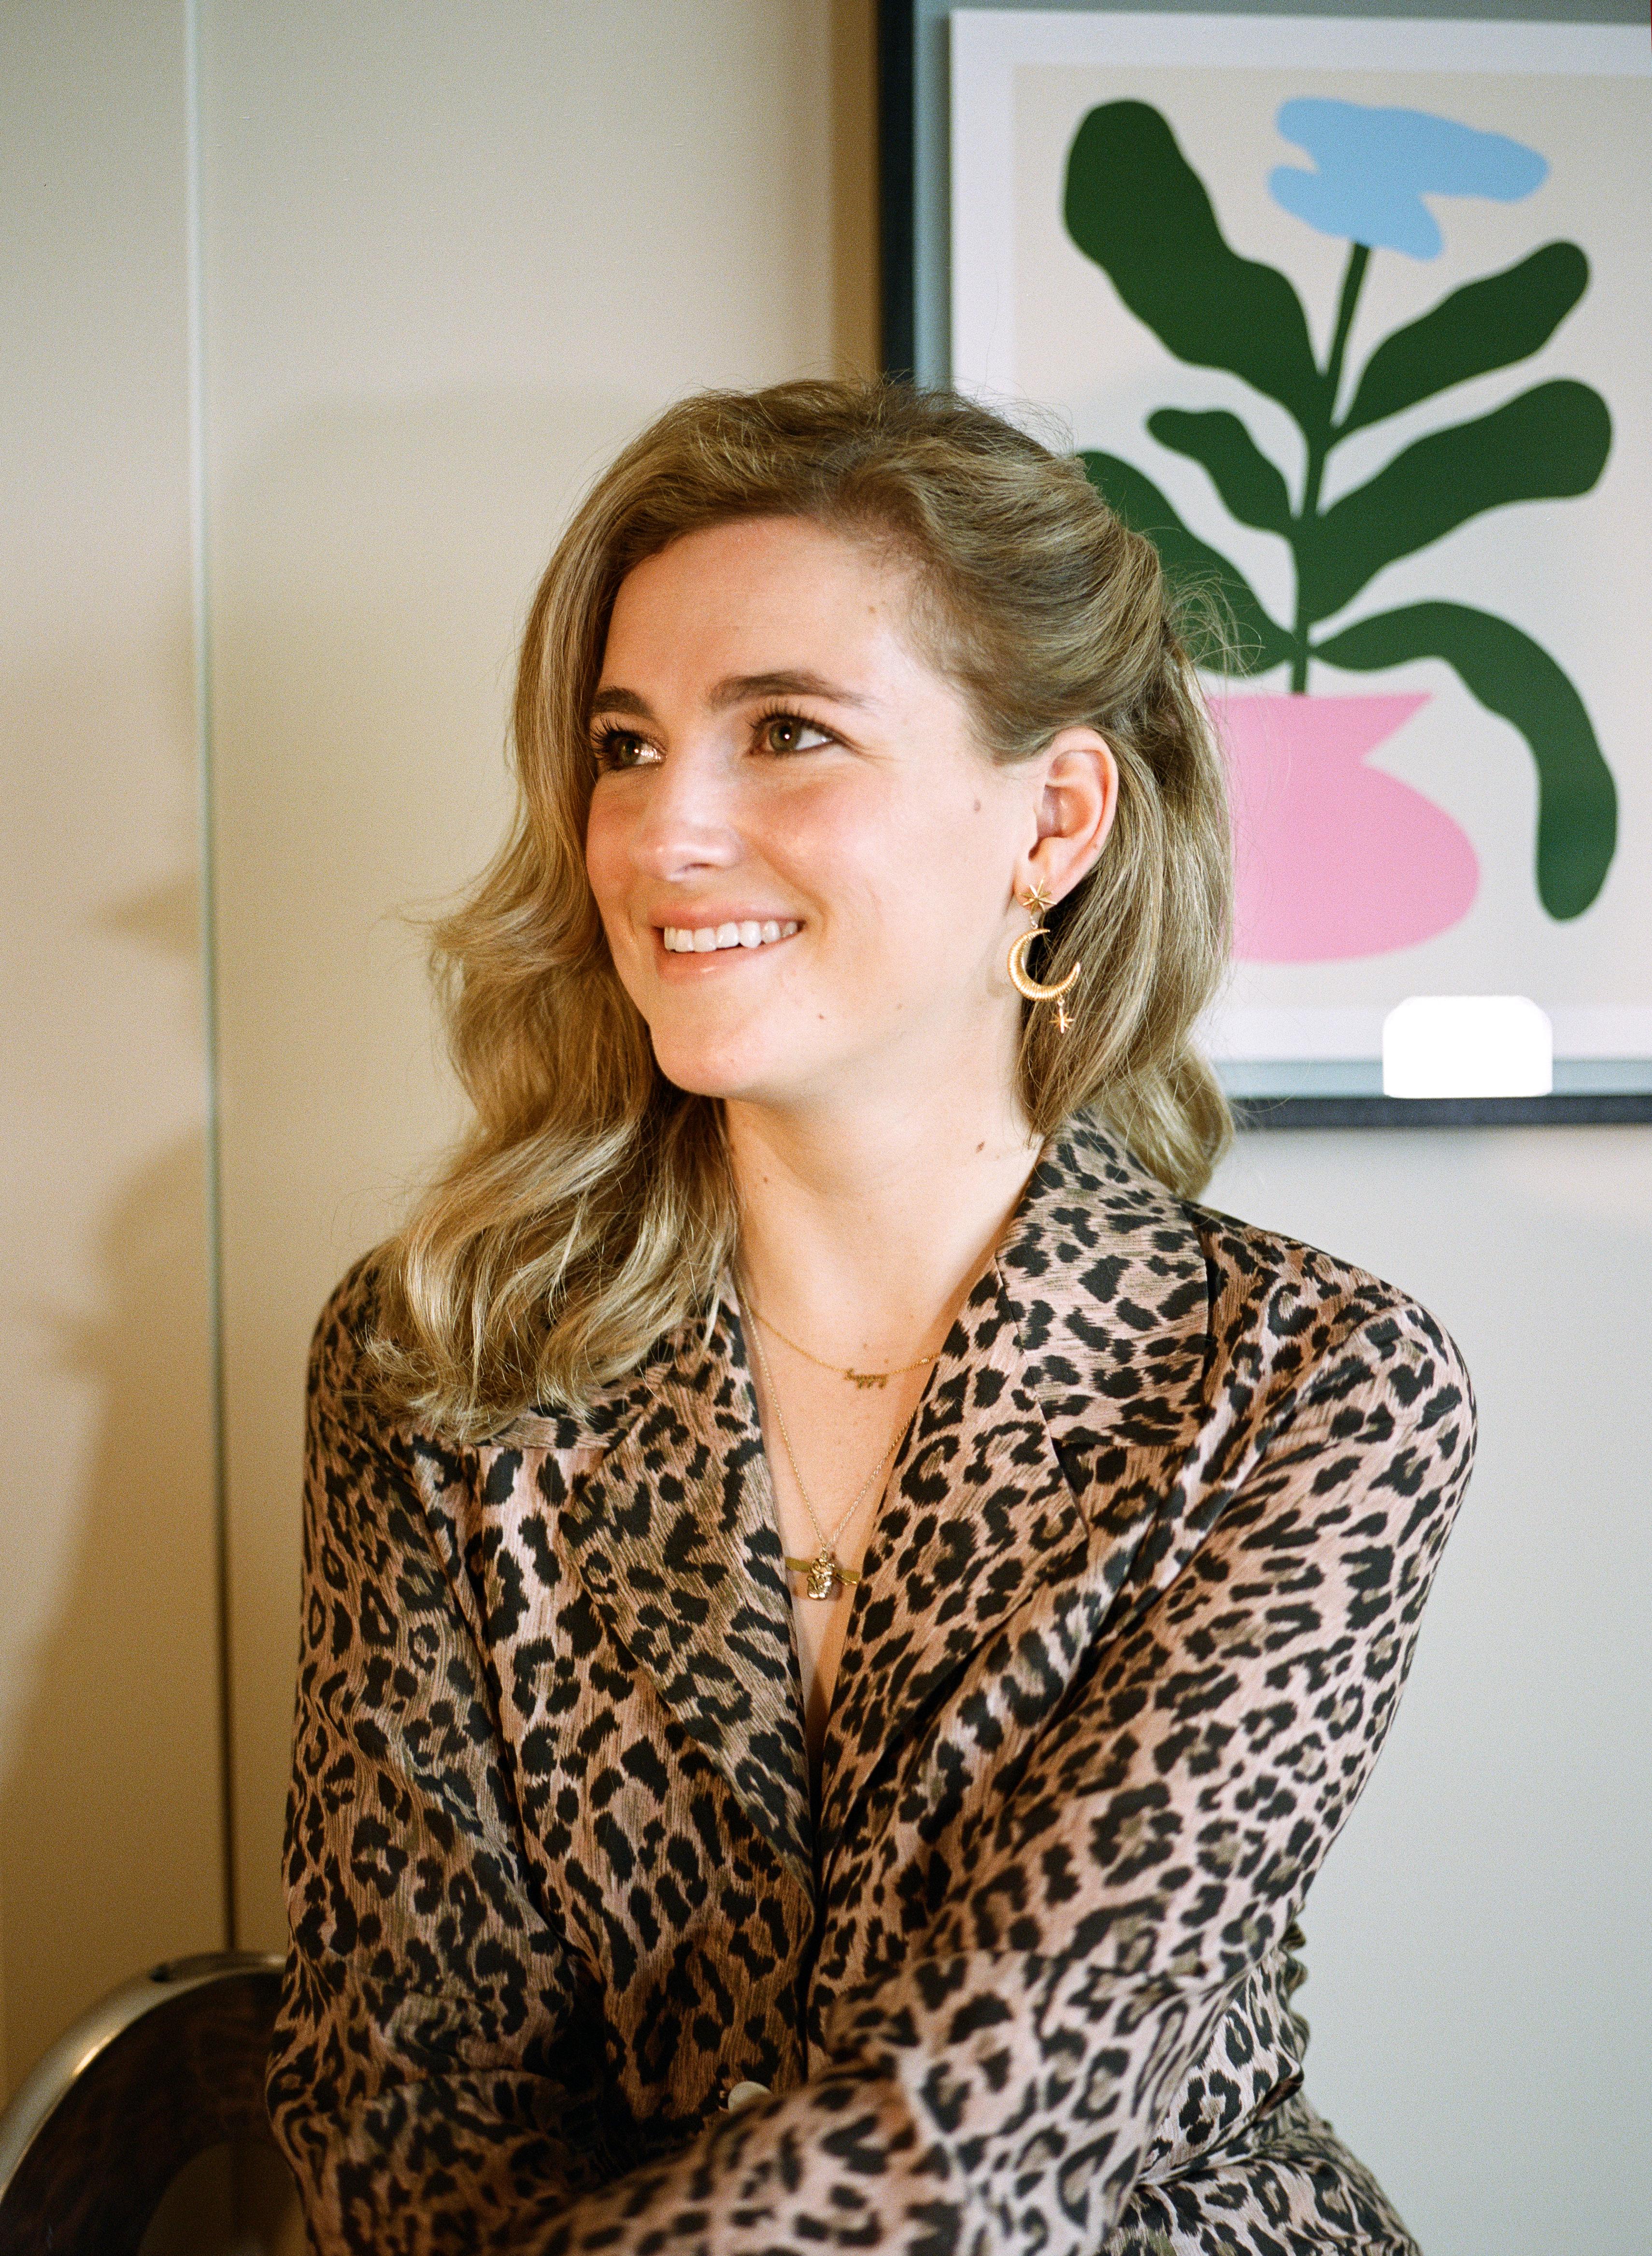 Megan Felton